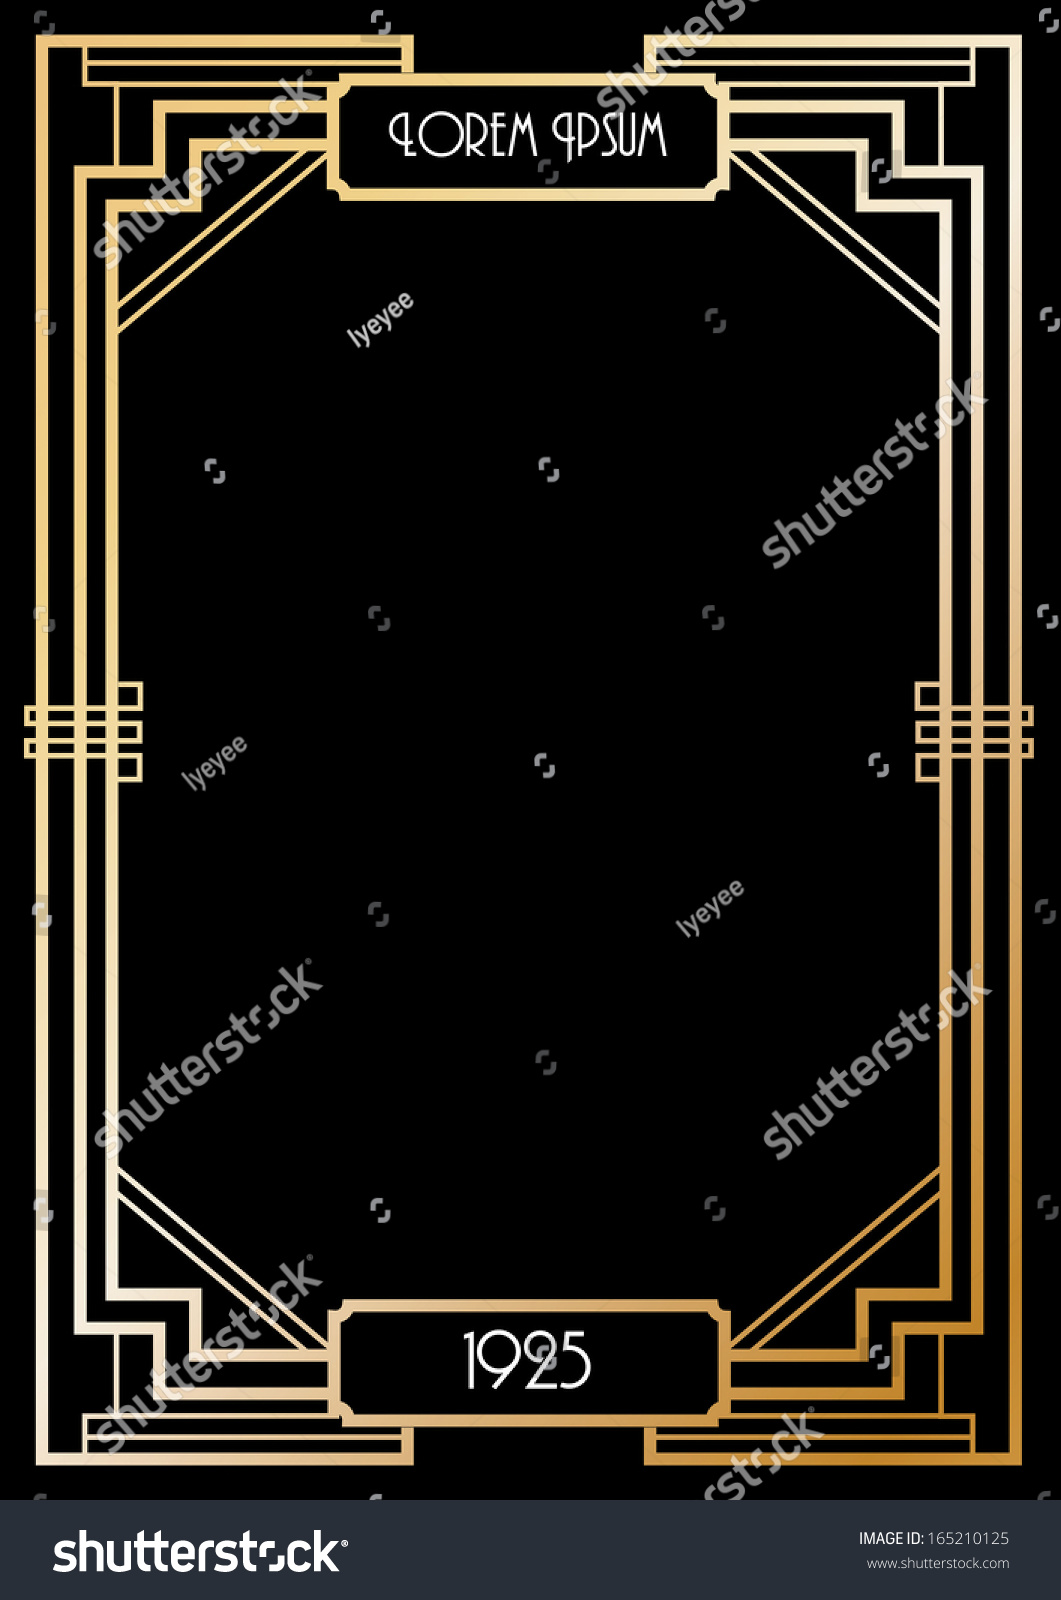 art deco border template vectorillustration のベクター画像素材